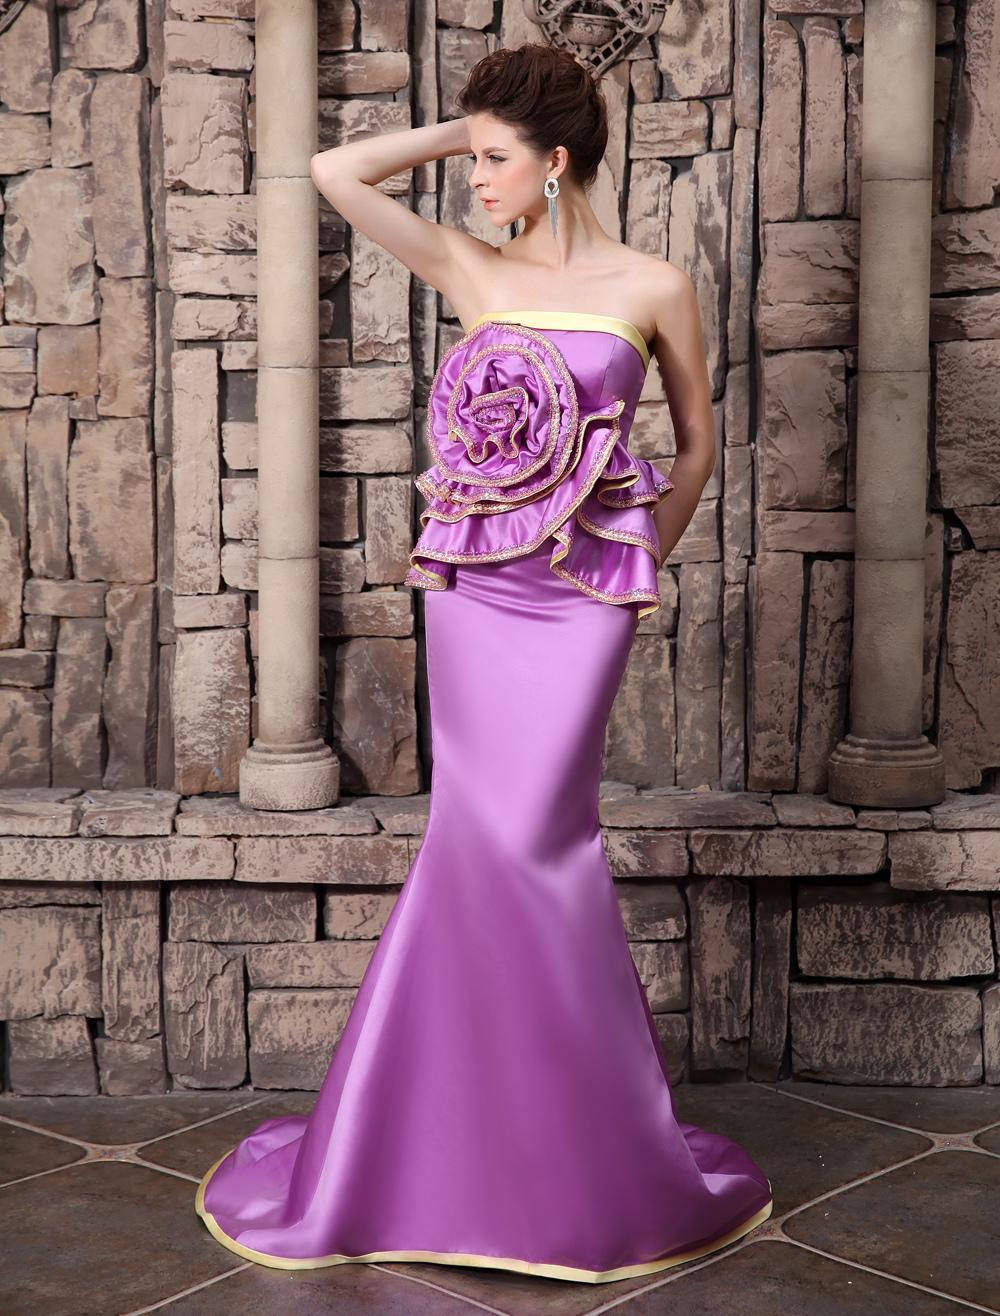 Mermaid Evening Dress Fuchsia Pink Satin Mother's Dress Strapless Court Train Beading Party Dress  Milanoo